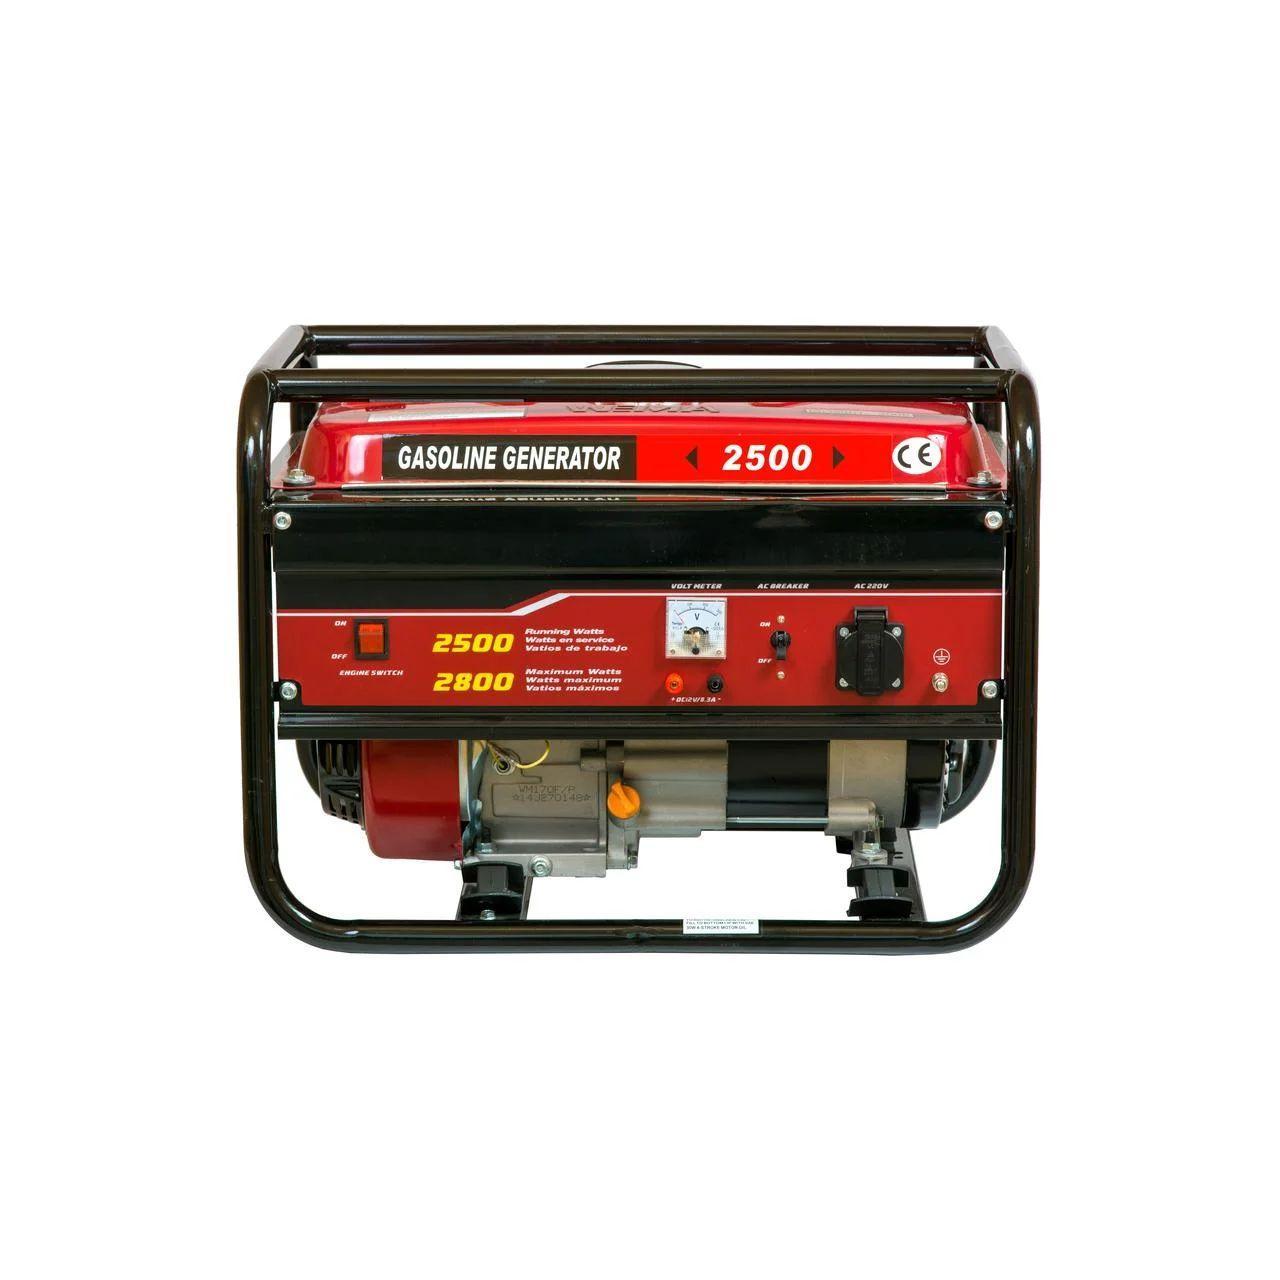 Бензиновий генератор WEIMA WM2500 (2,5 КВТ, 1 ФАЗА, РУЧНИЙ СТАРТ) Безкоштовна доставка !!!